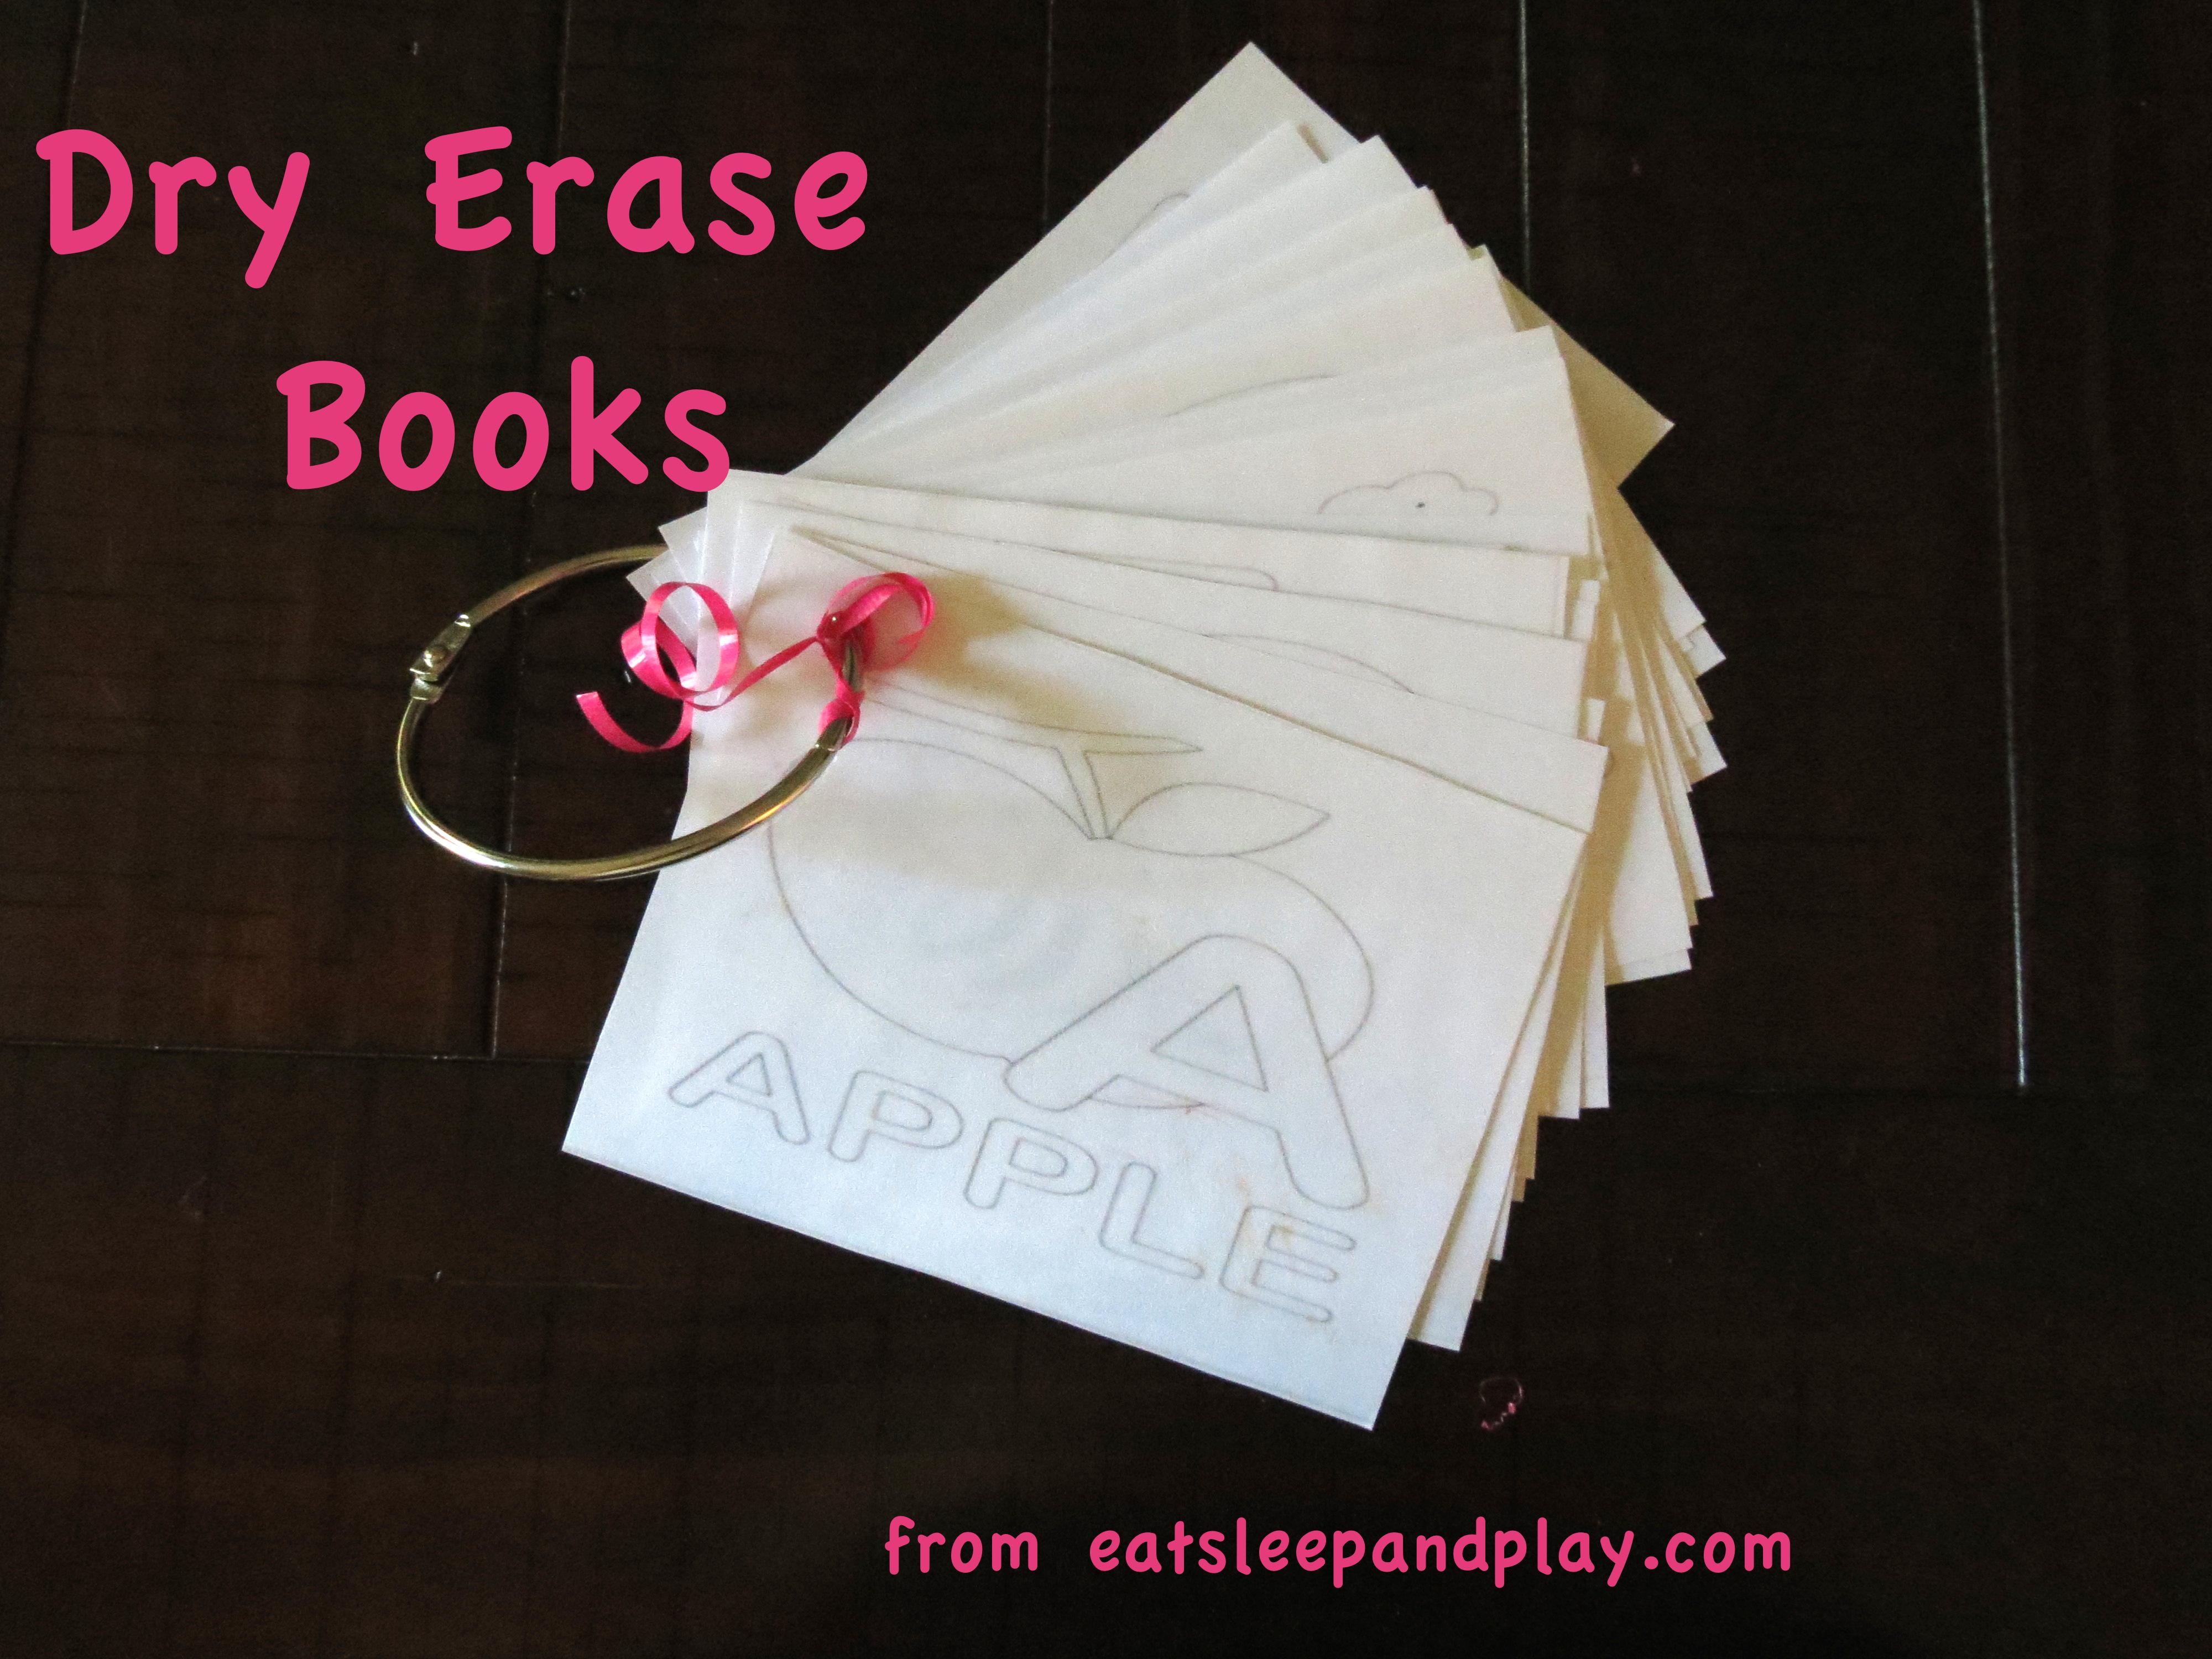 dry erase book title